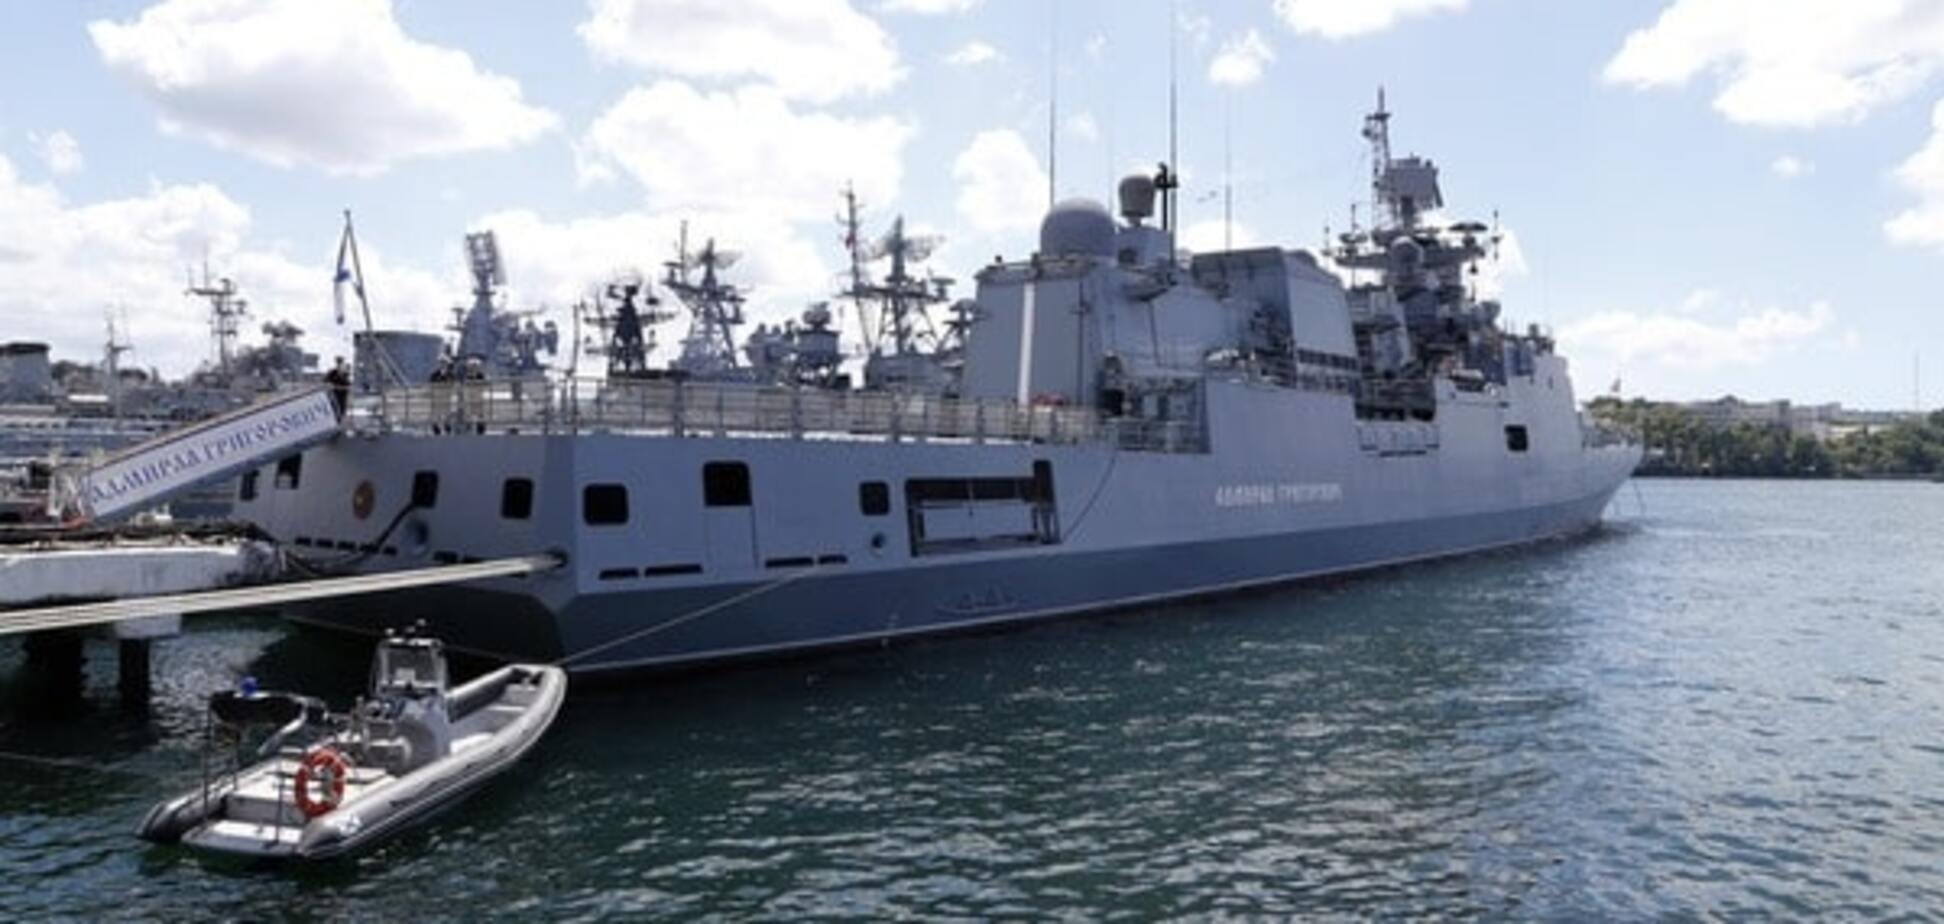 Жители Крыма устроили сбой в системе связи Черноморского флота - разведка